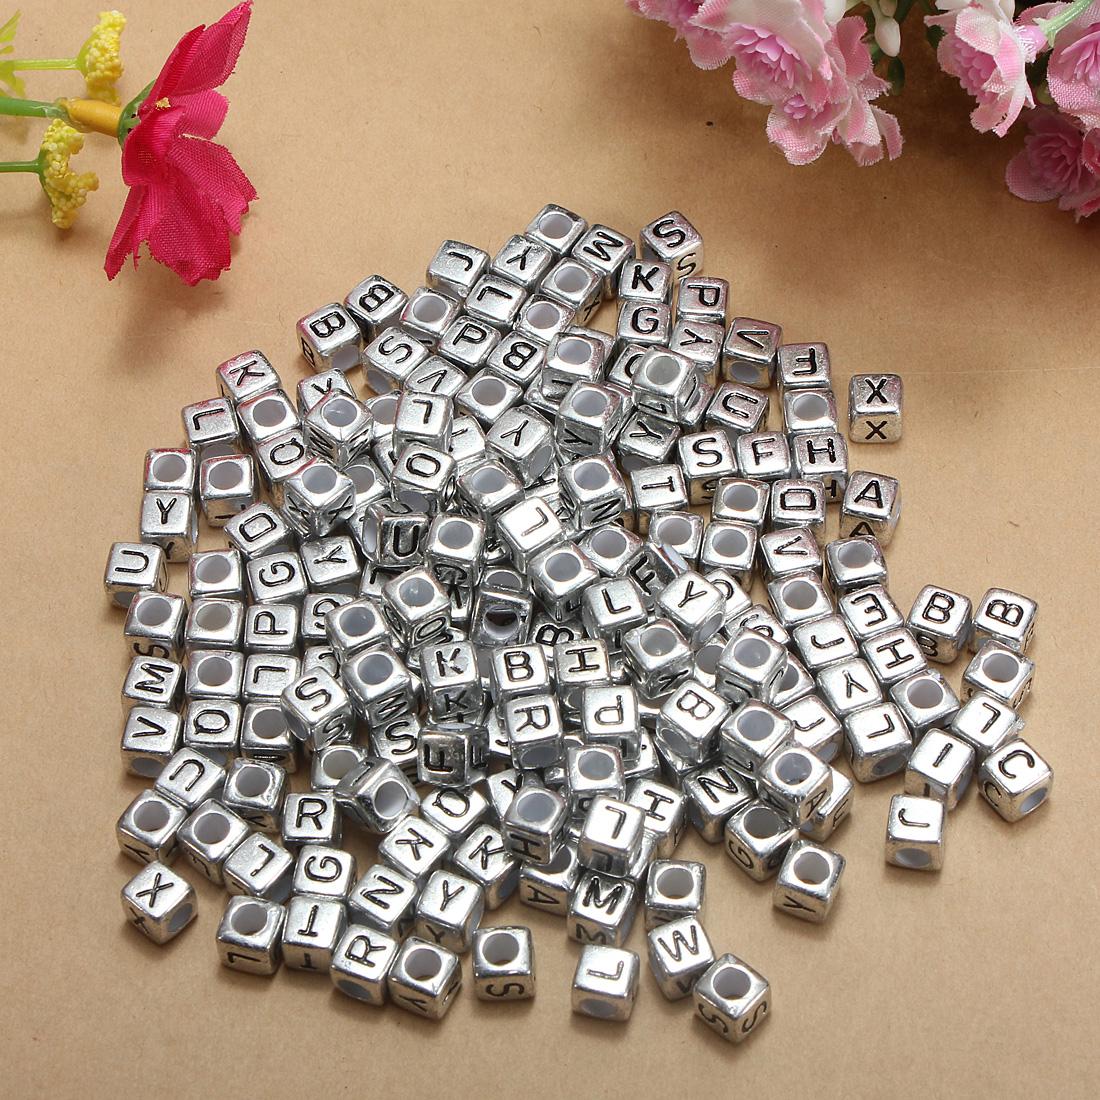 Silver Alphabet Beads: 200pcs 6mm Letters Silver Cube Plastic Acrylic Alphabet